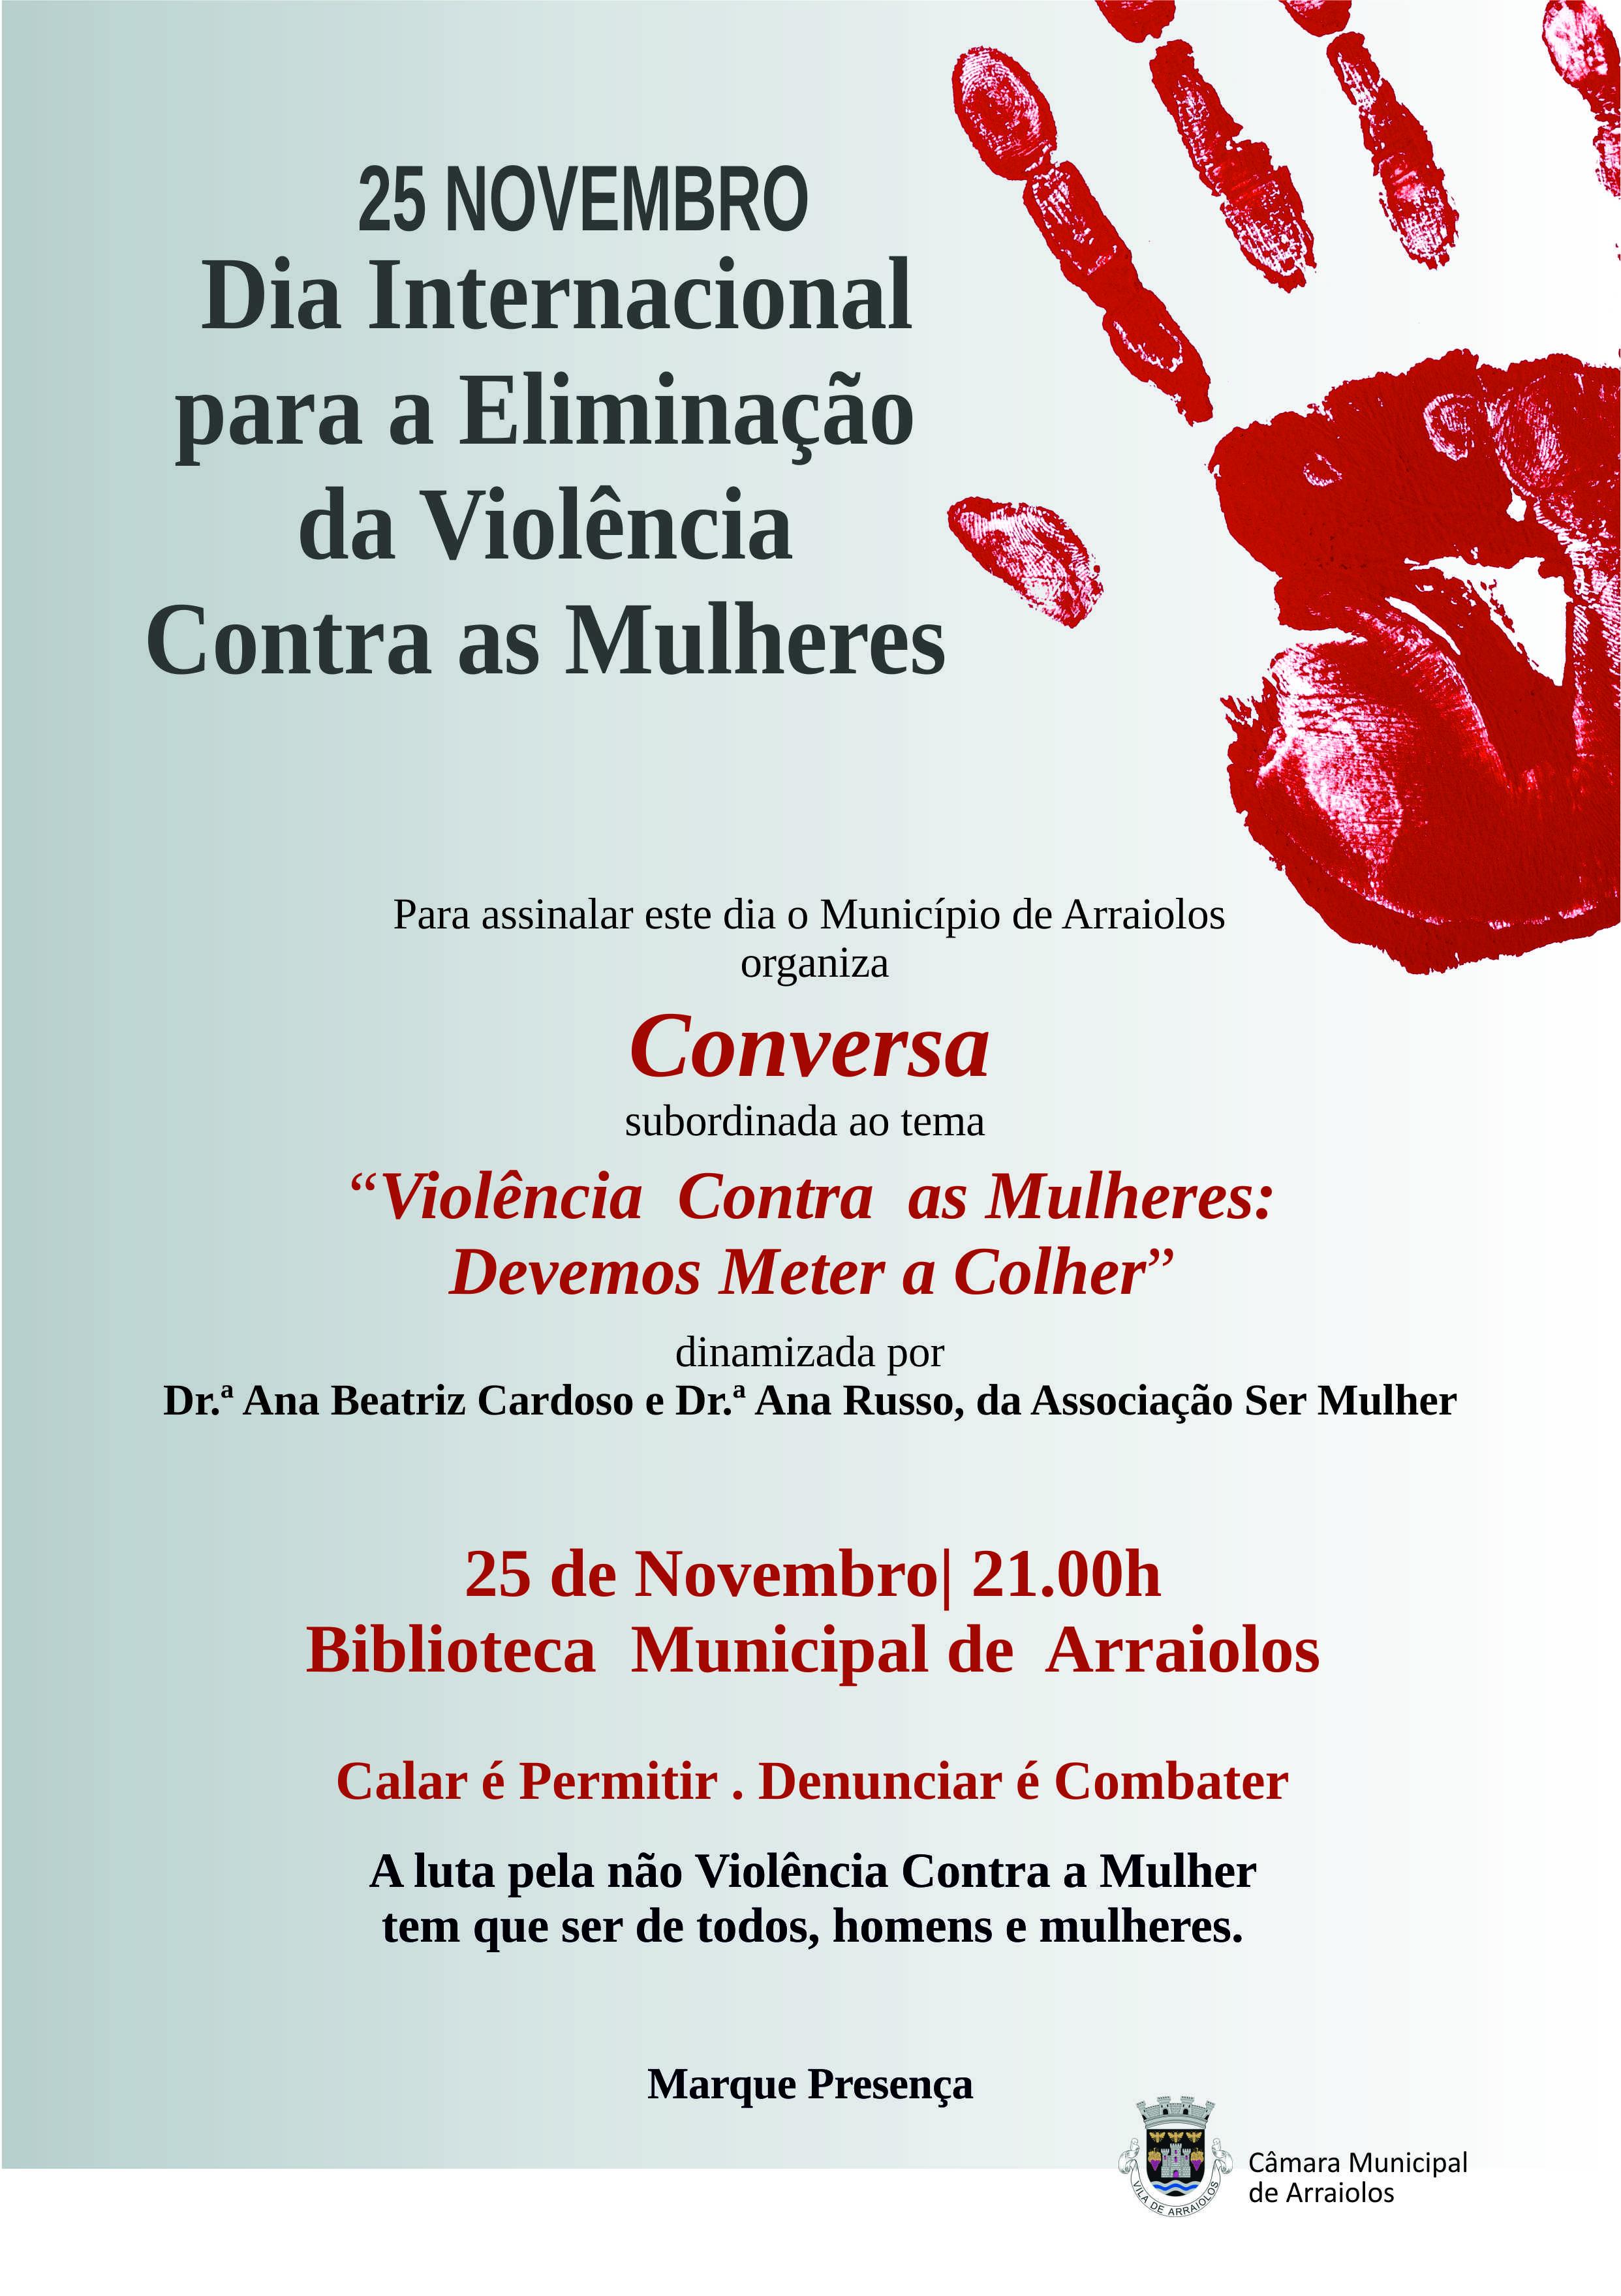 Conversa Violencia contra as Mulheres(1).jpg